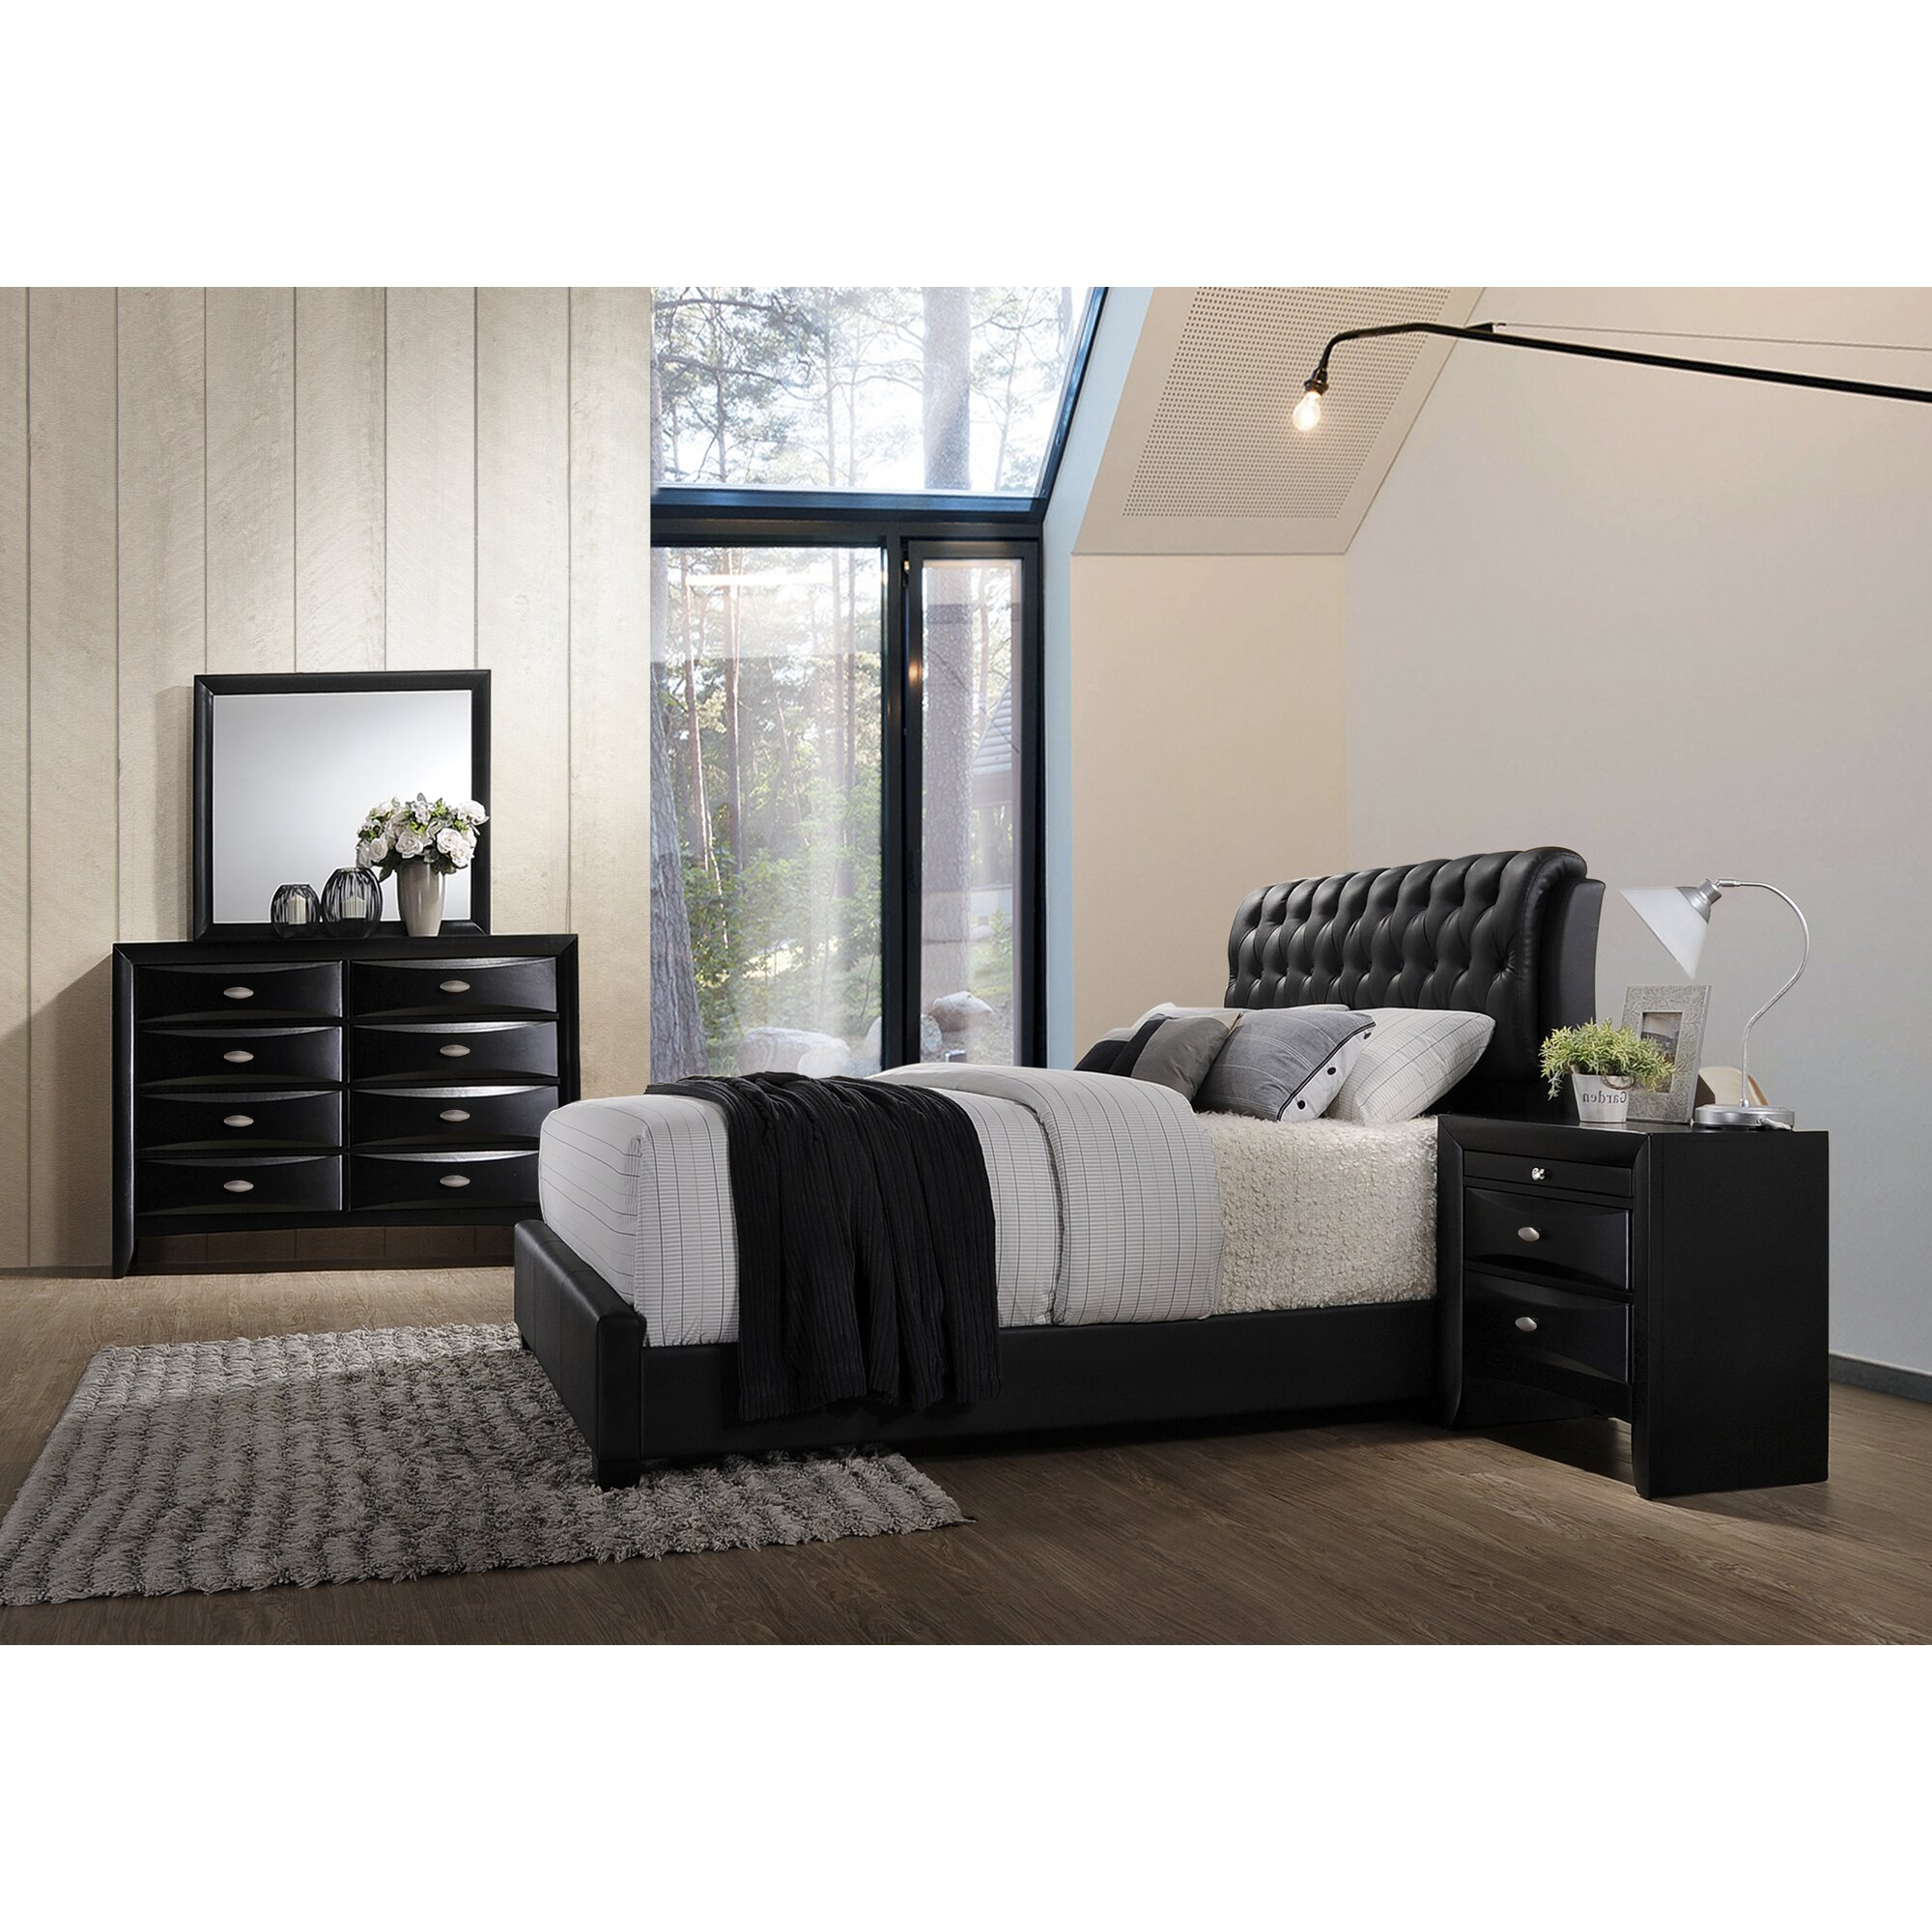 Bedroom Sets: Roundhill Furniture Blemerey 4 Piece Bedroom Set